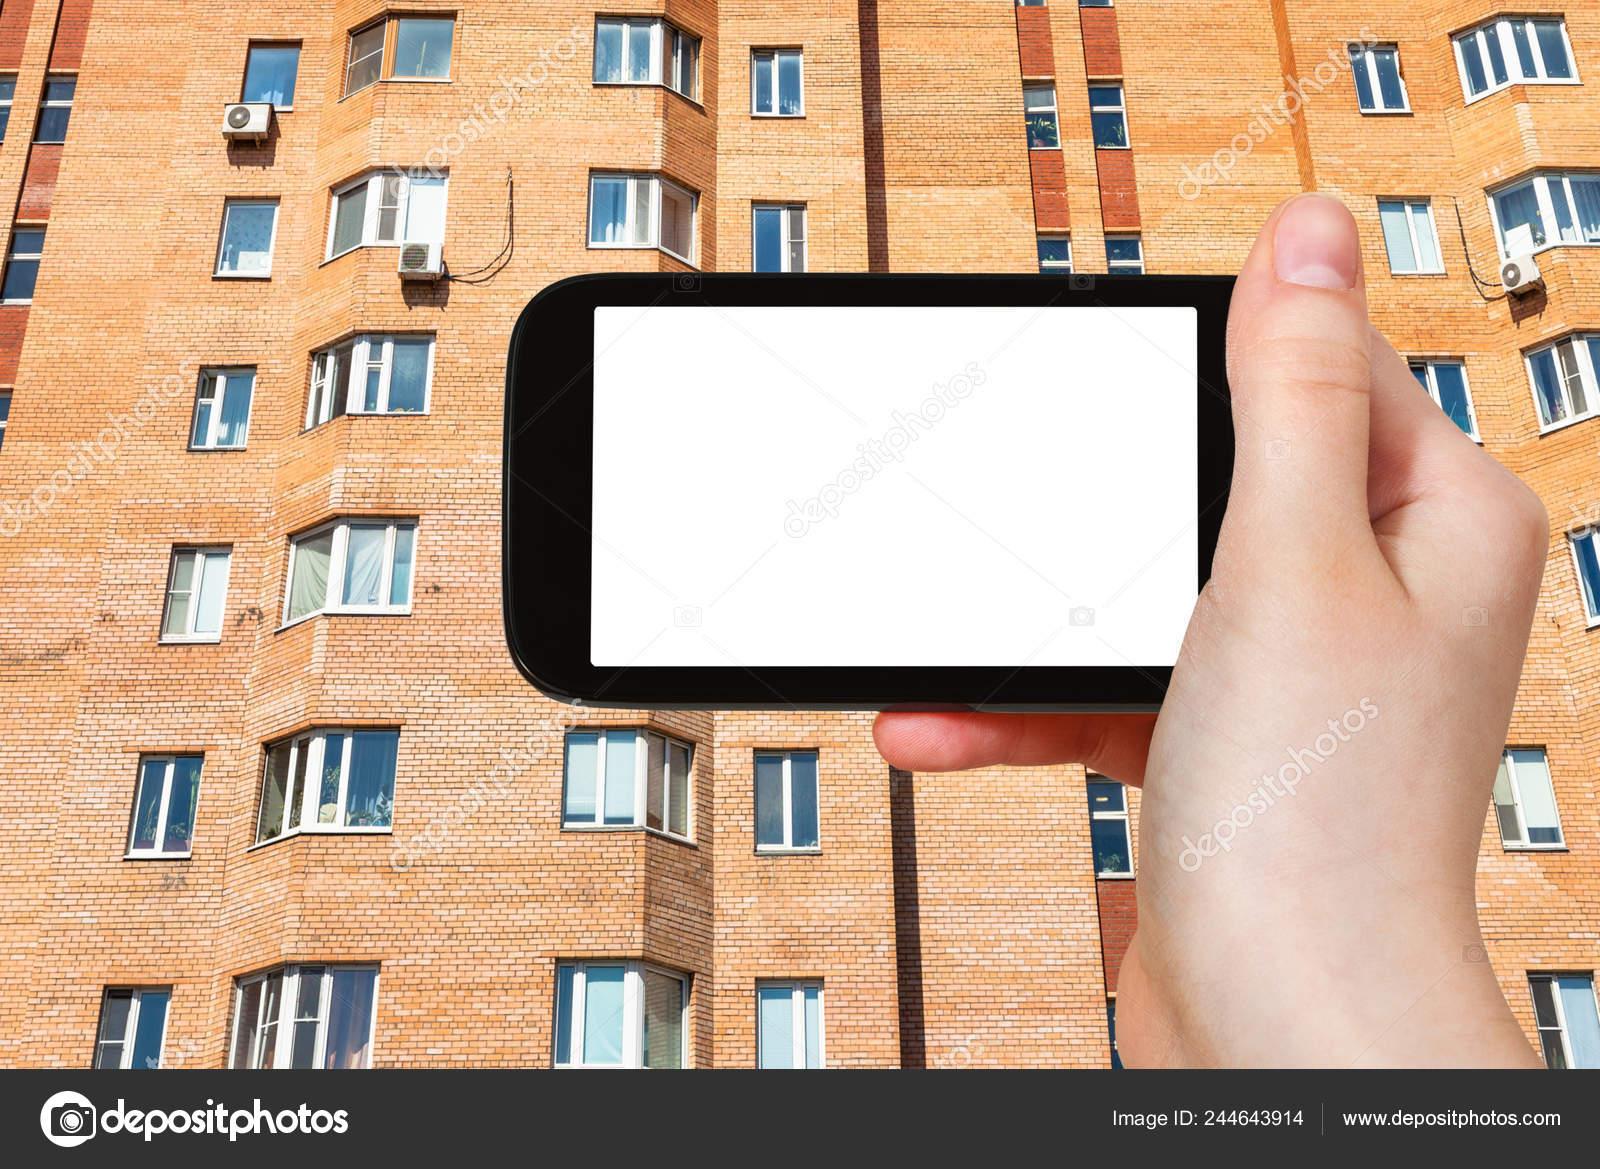 Travel Concept Tourist Photographs Facade Urban Brick Multi Storey House Stock Photo C Vvoennyy 244643914